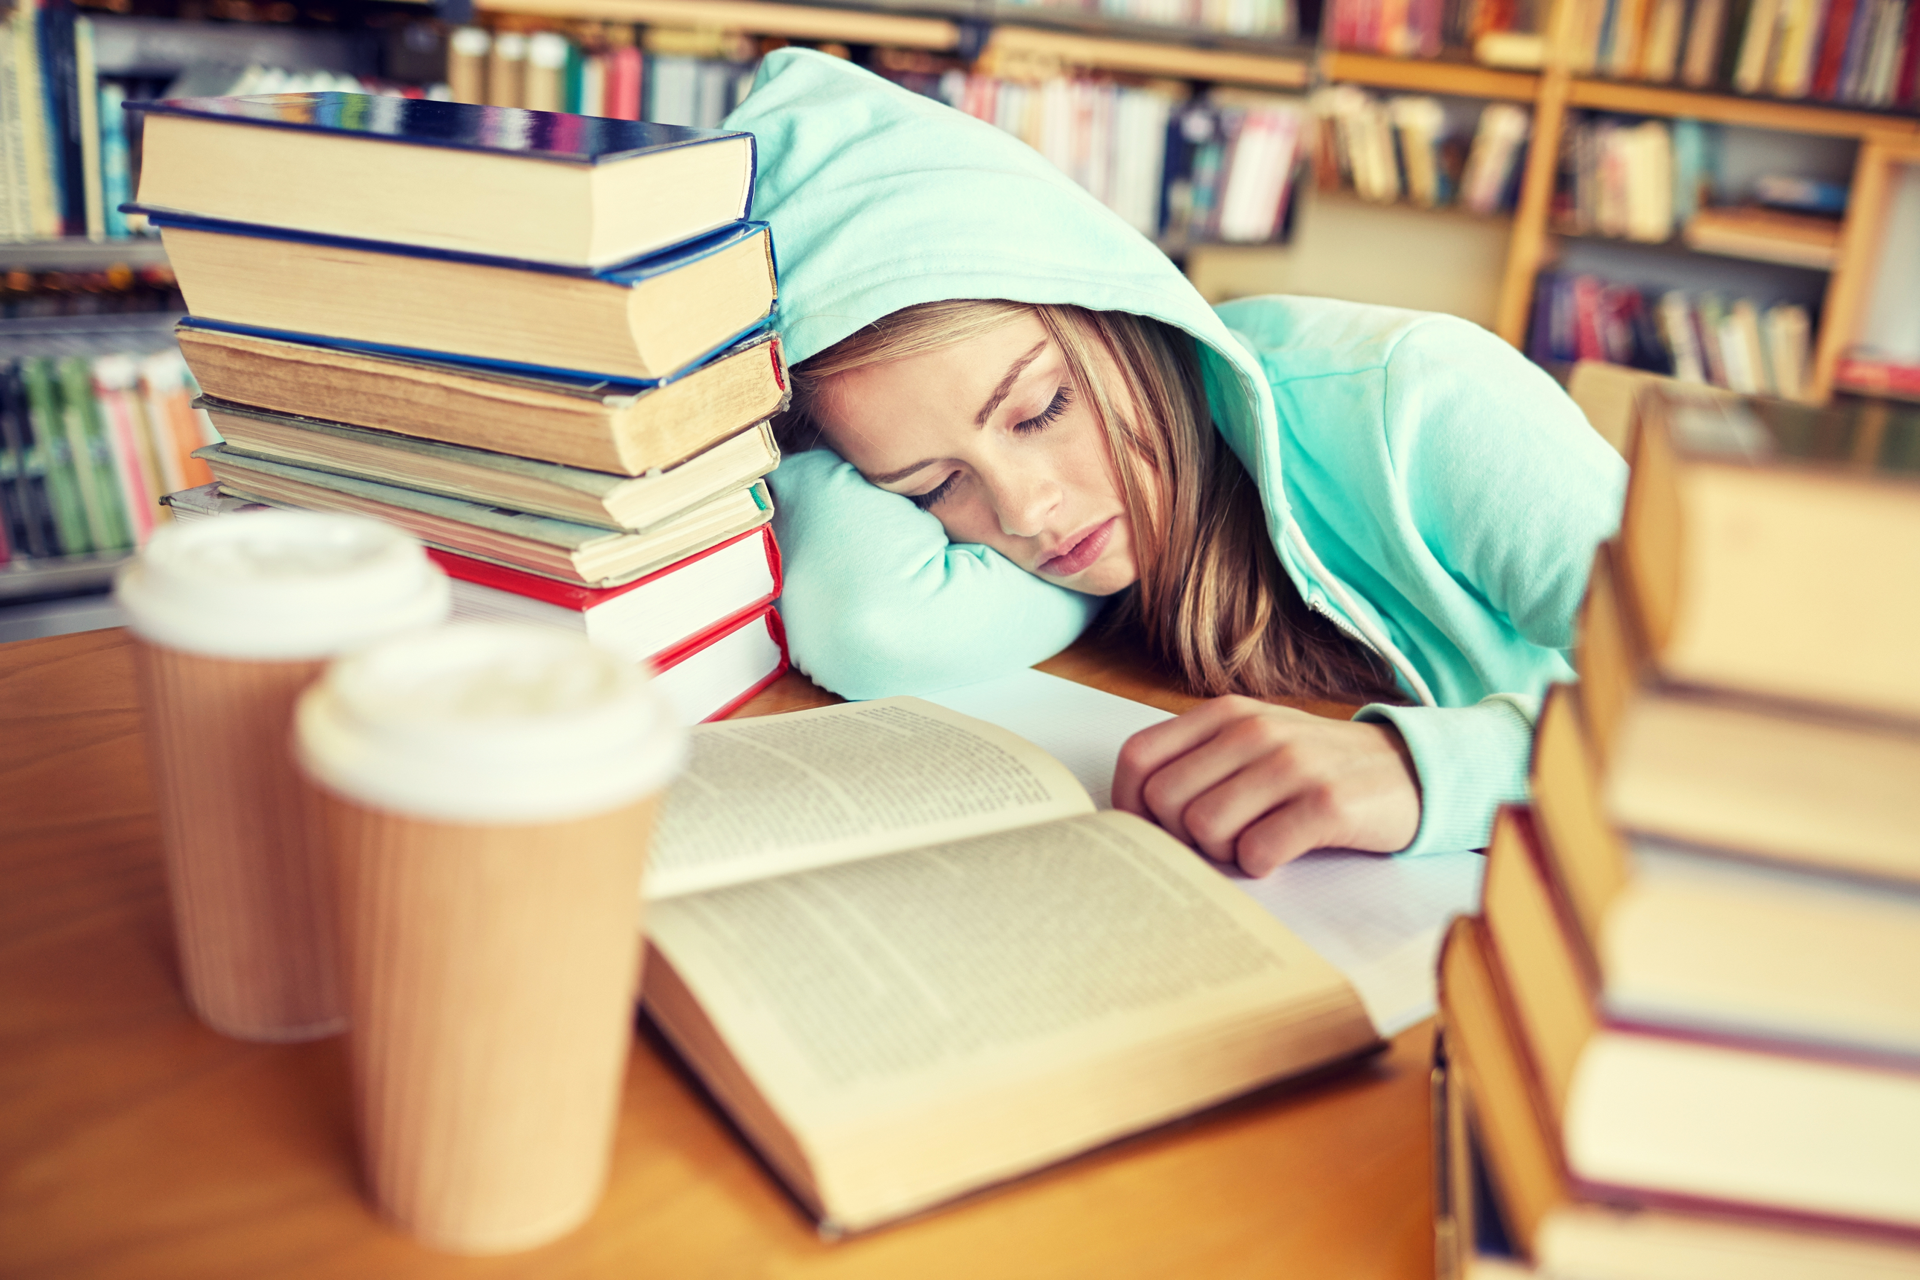 Randy gardner sleep study